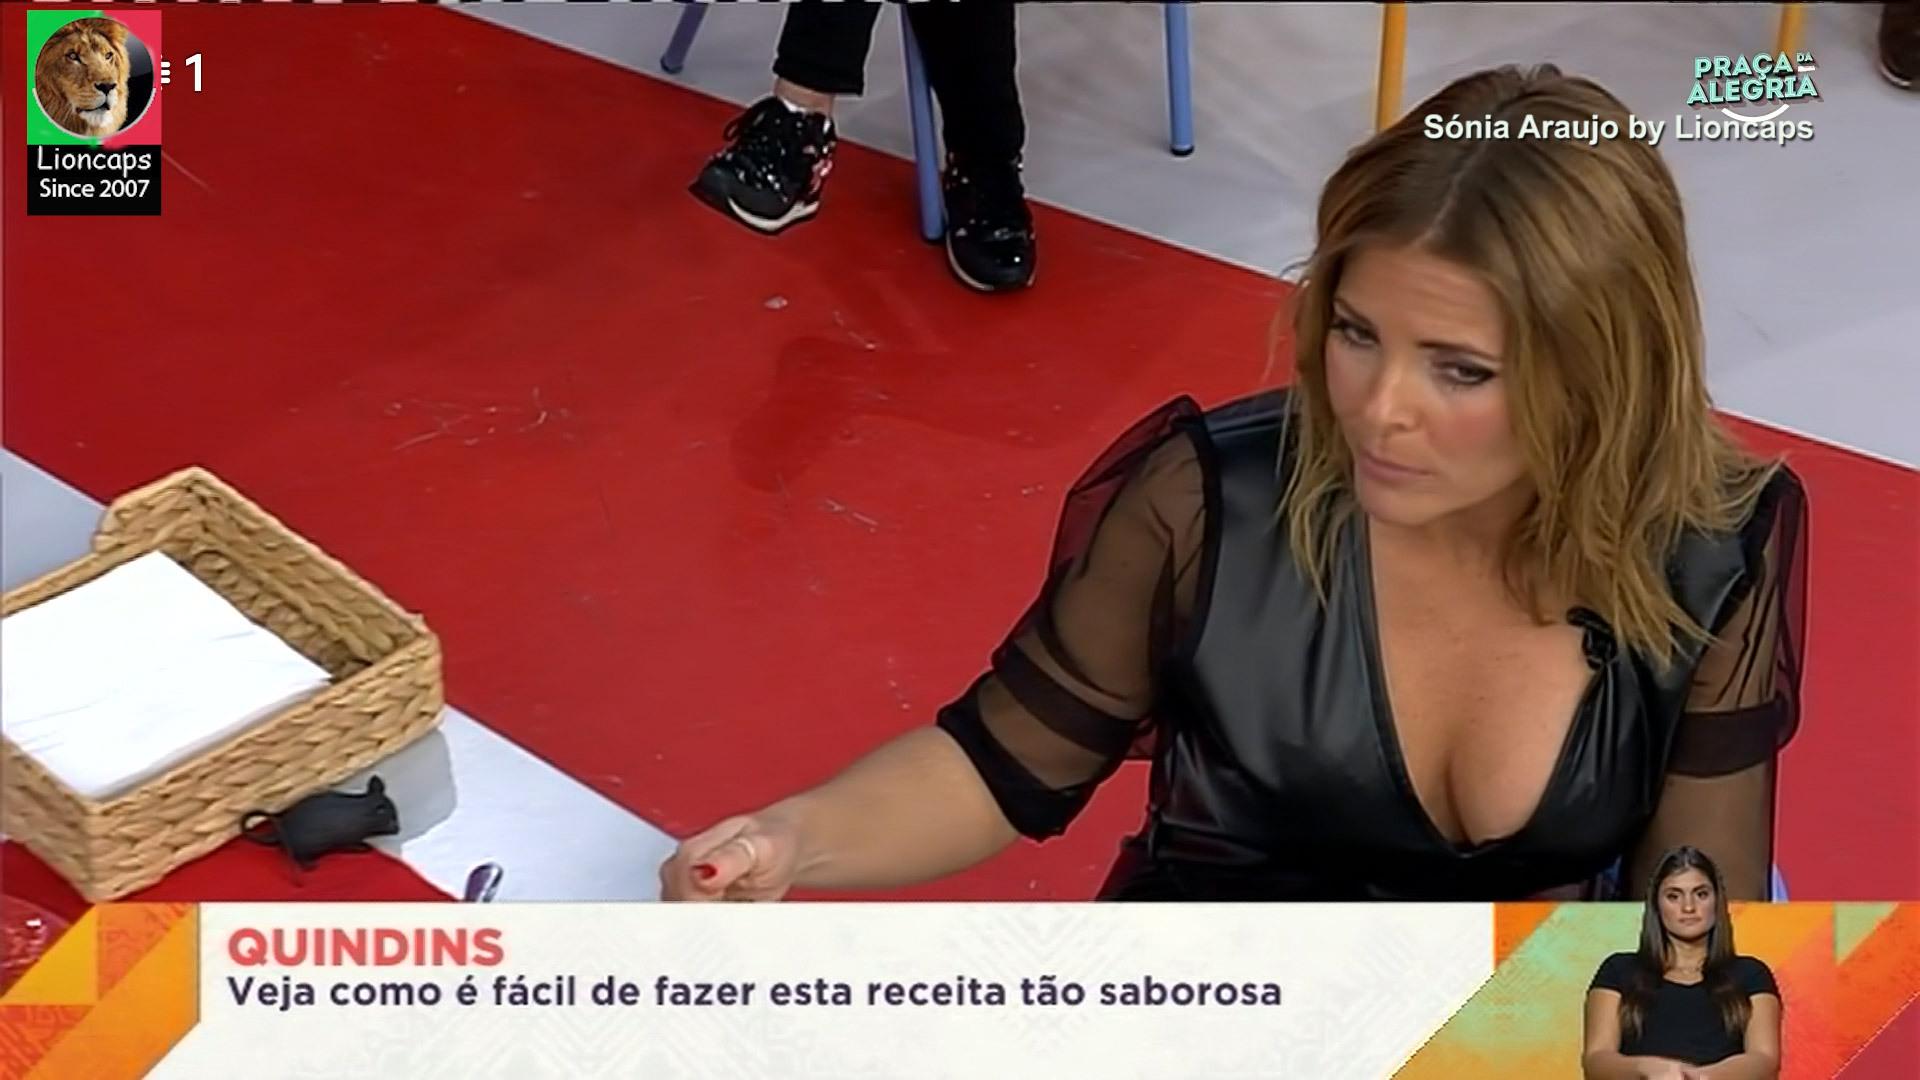 sonia_araujo_praca_lioncaps_27_03_2021_02 (2).jpg